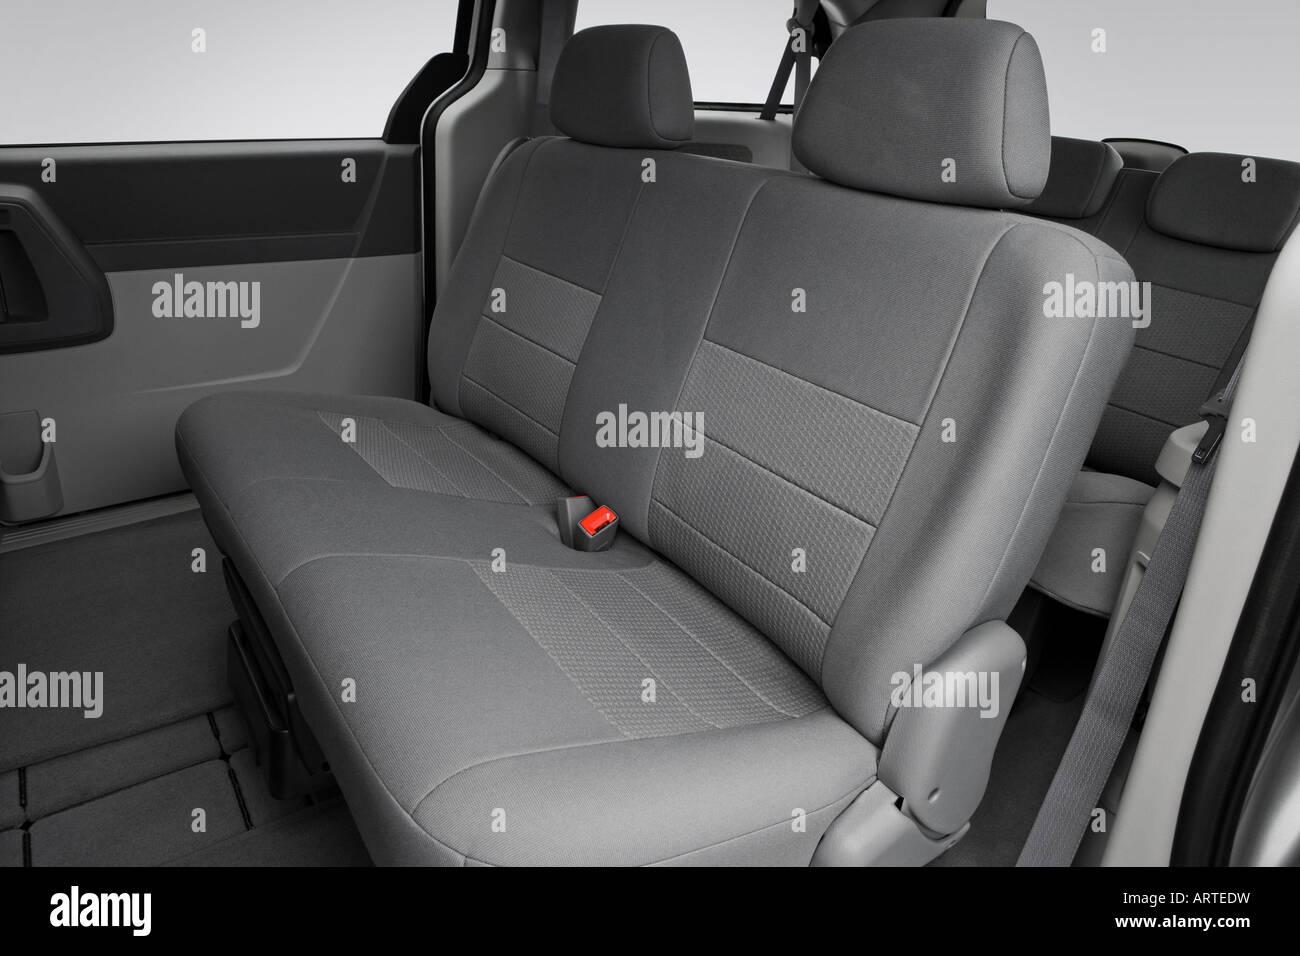 hight resolution of 2008 dodge grand caravan se in silver rear seats stock image